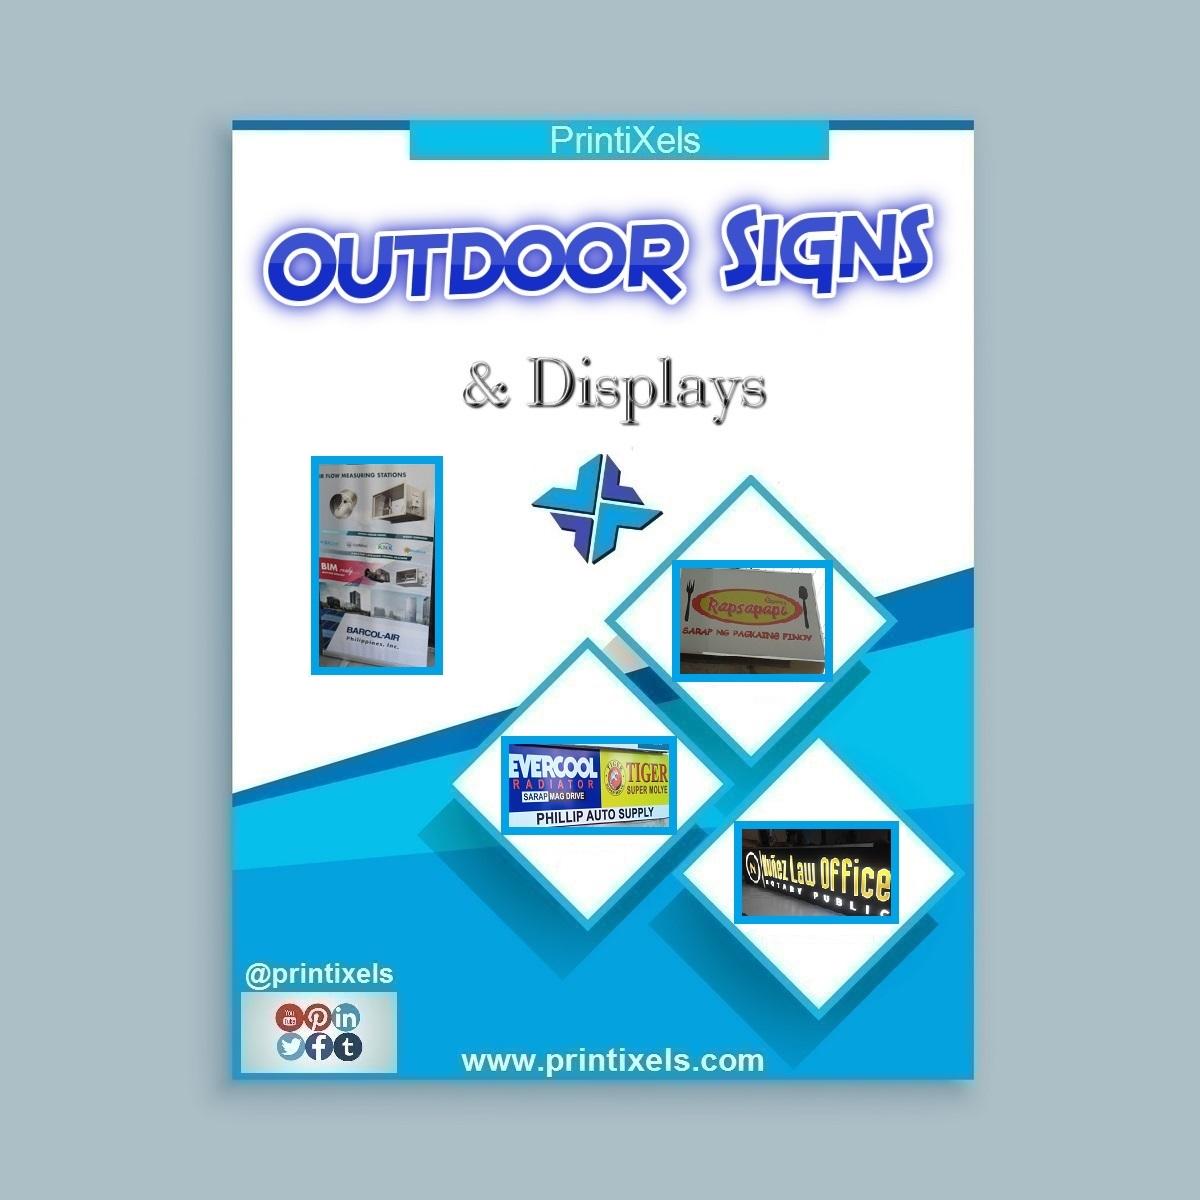 Custom Outdoor Signs & Displays